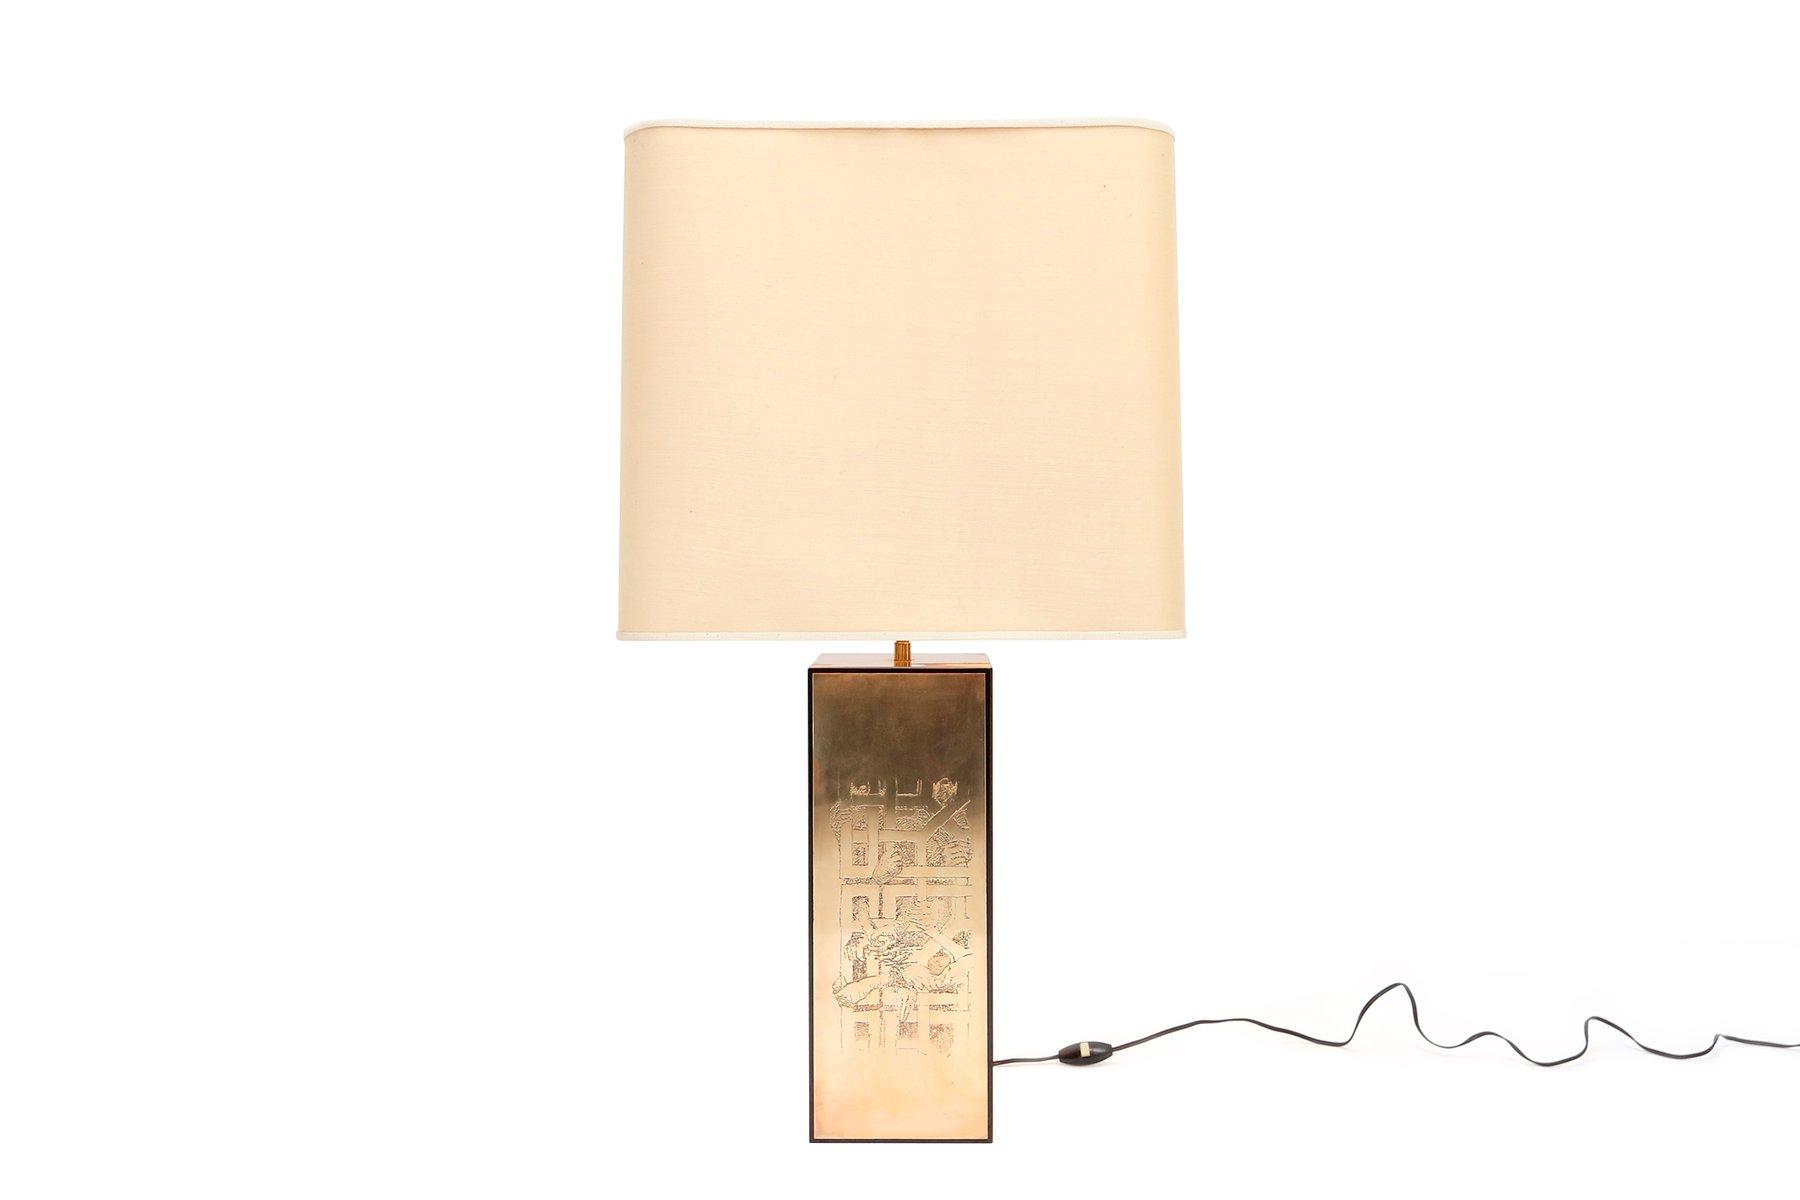 Tischlampe aus Geätztem Messing, 1970er